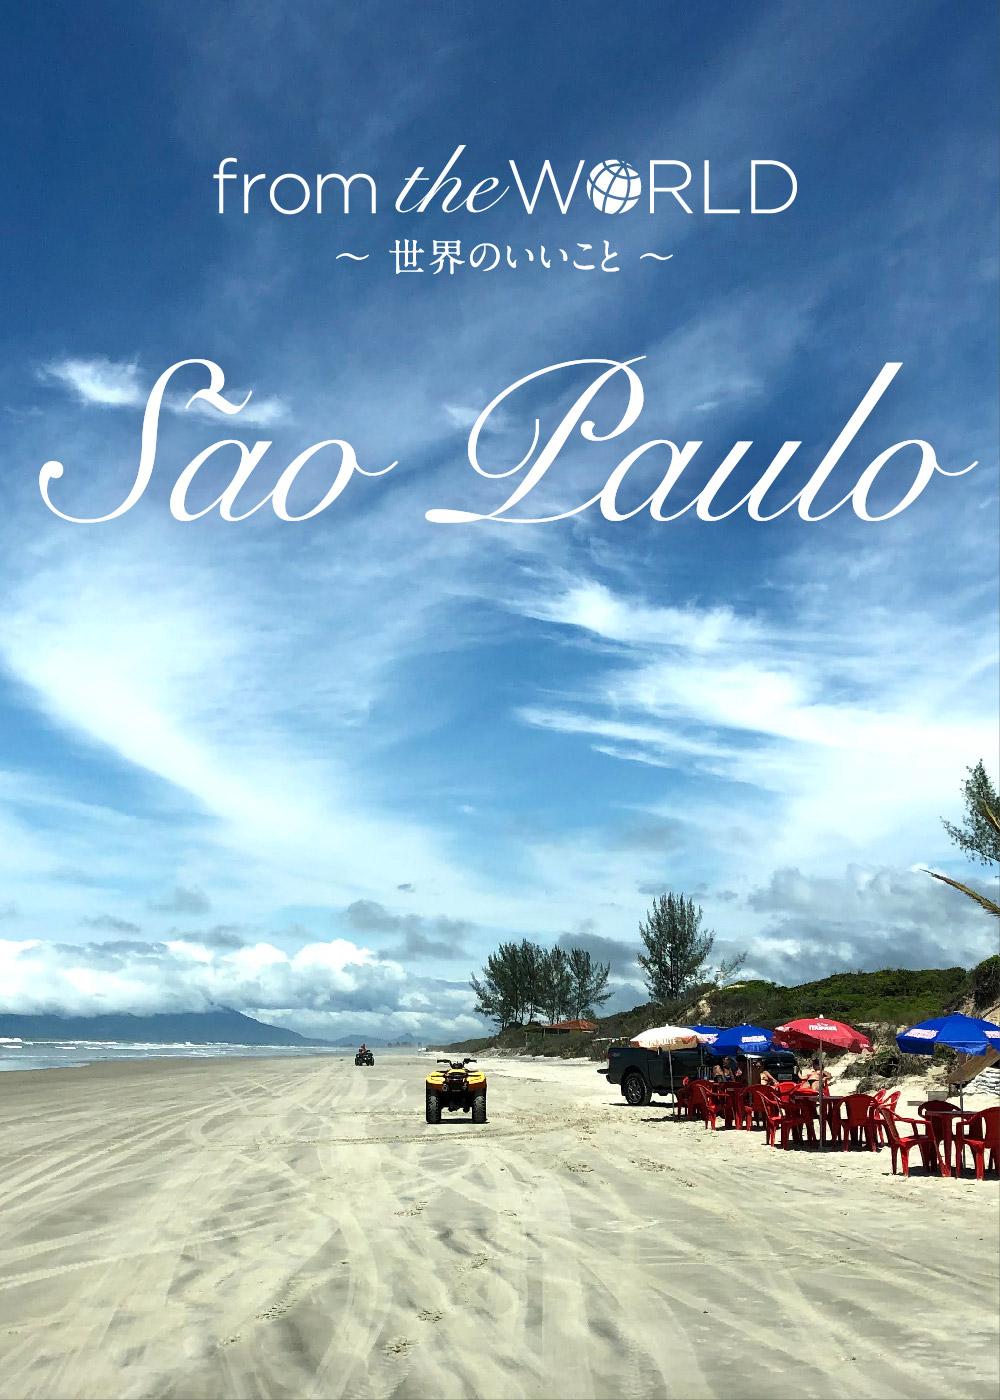 [from São Paulo]サンパウロのビーチクリーン大作戦【前編】by katsura Ishihara